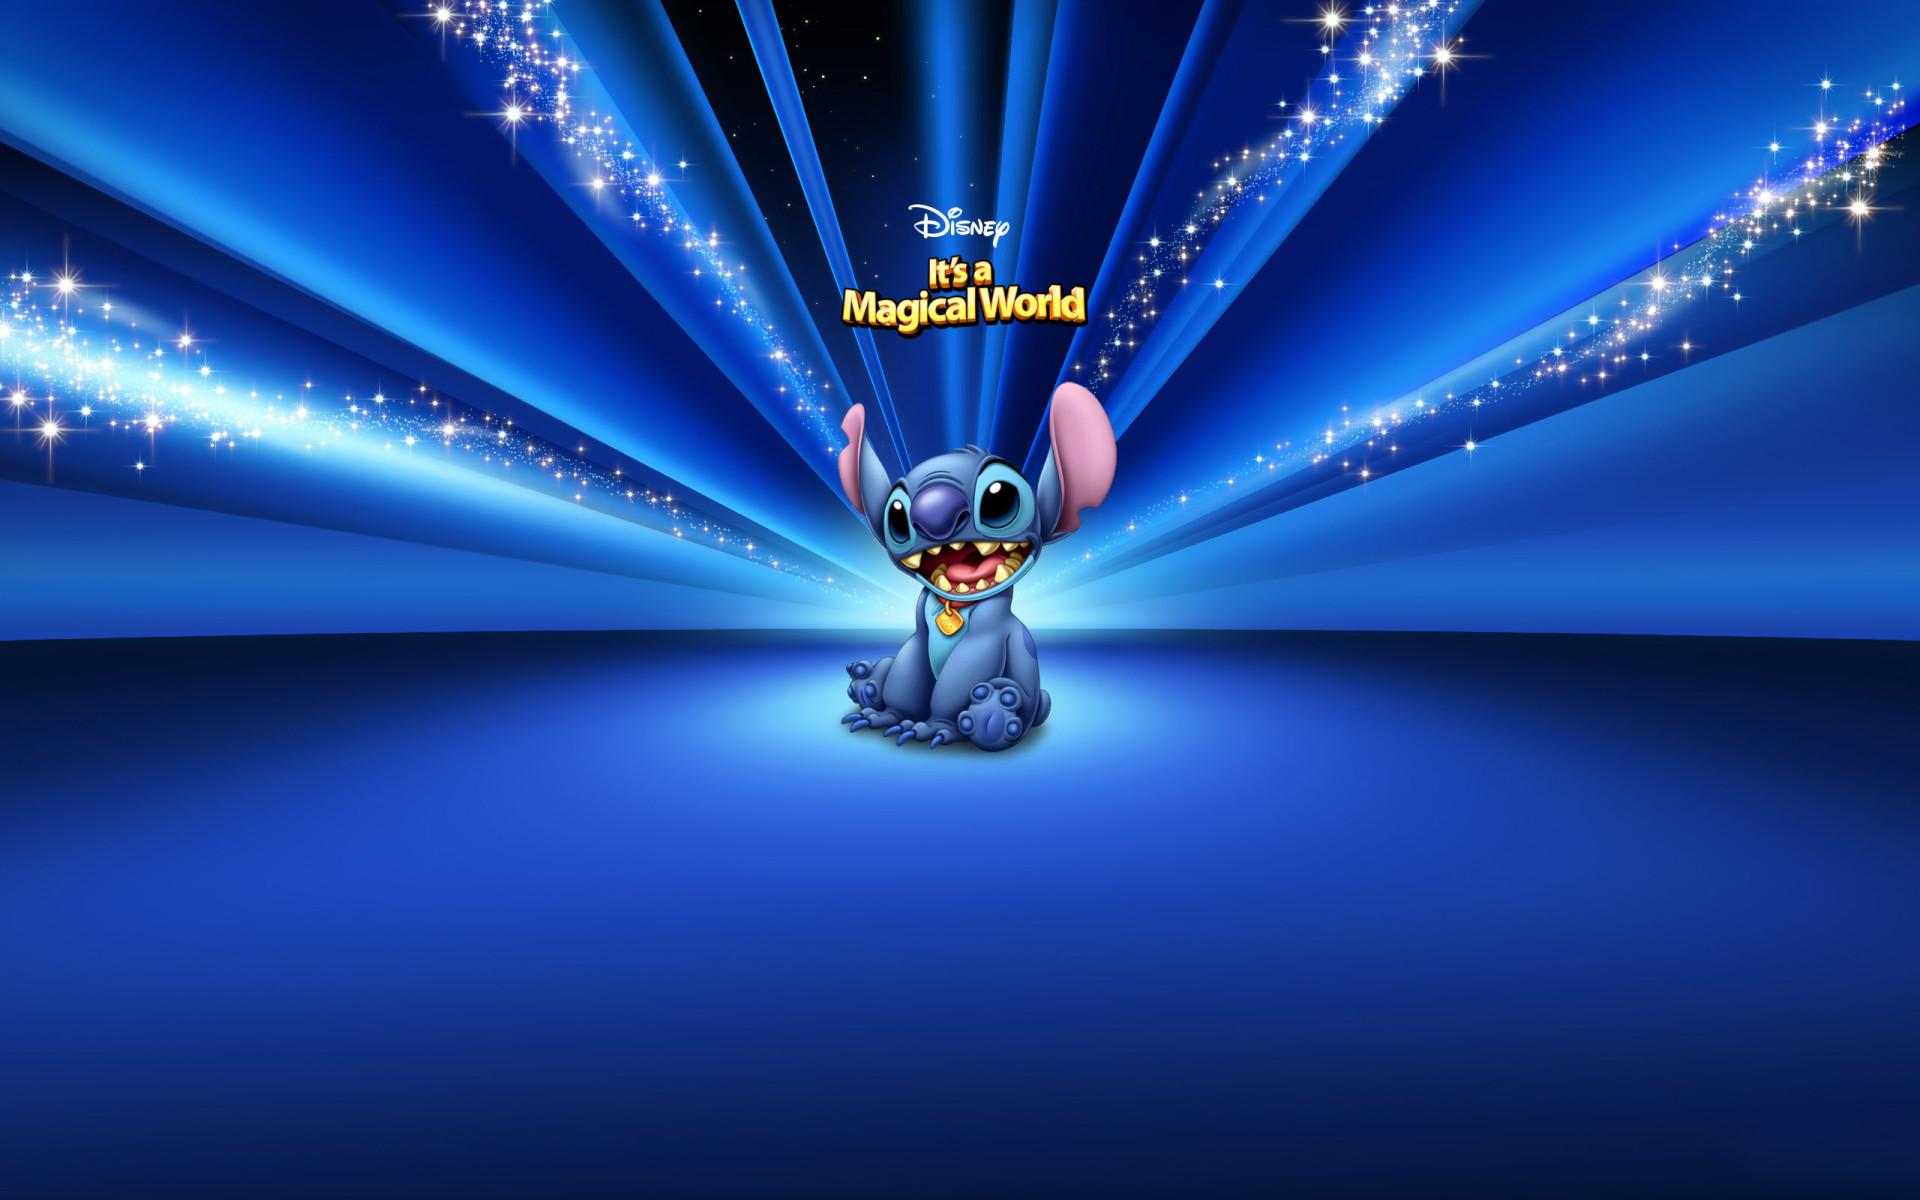 Desktop Wallpapers Disney Lilo Stitch Cartoons